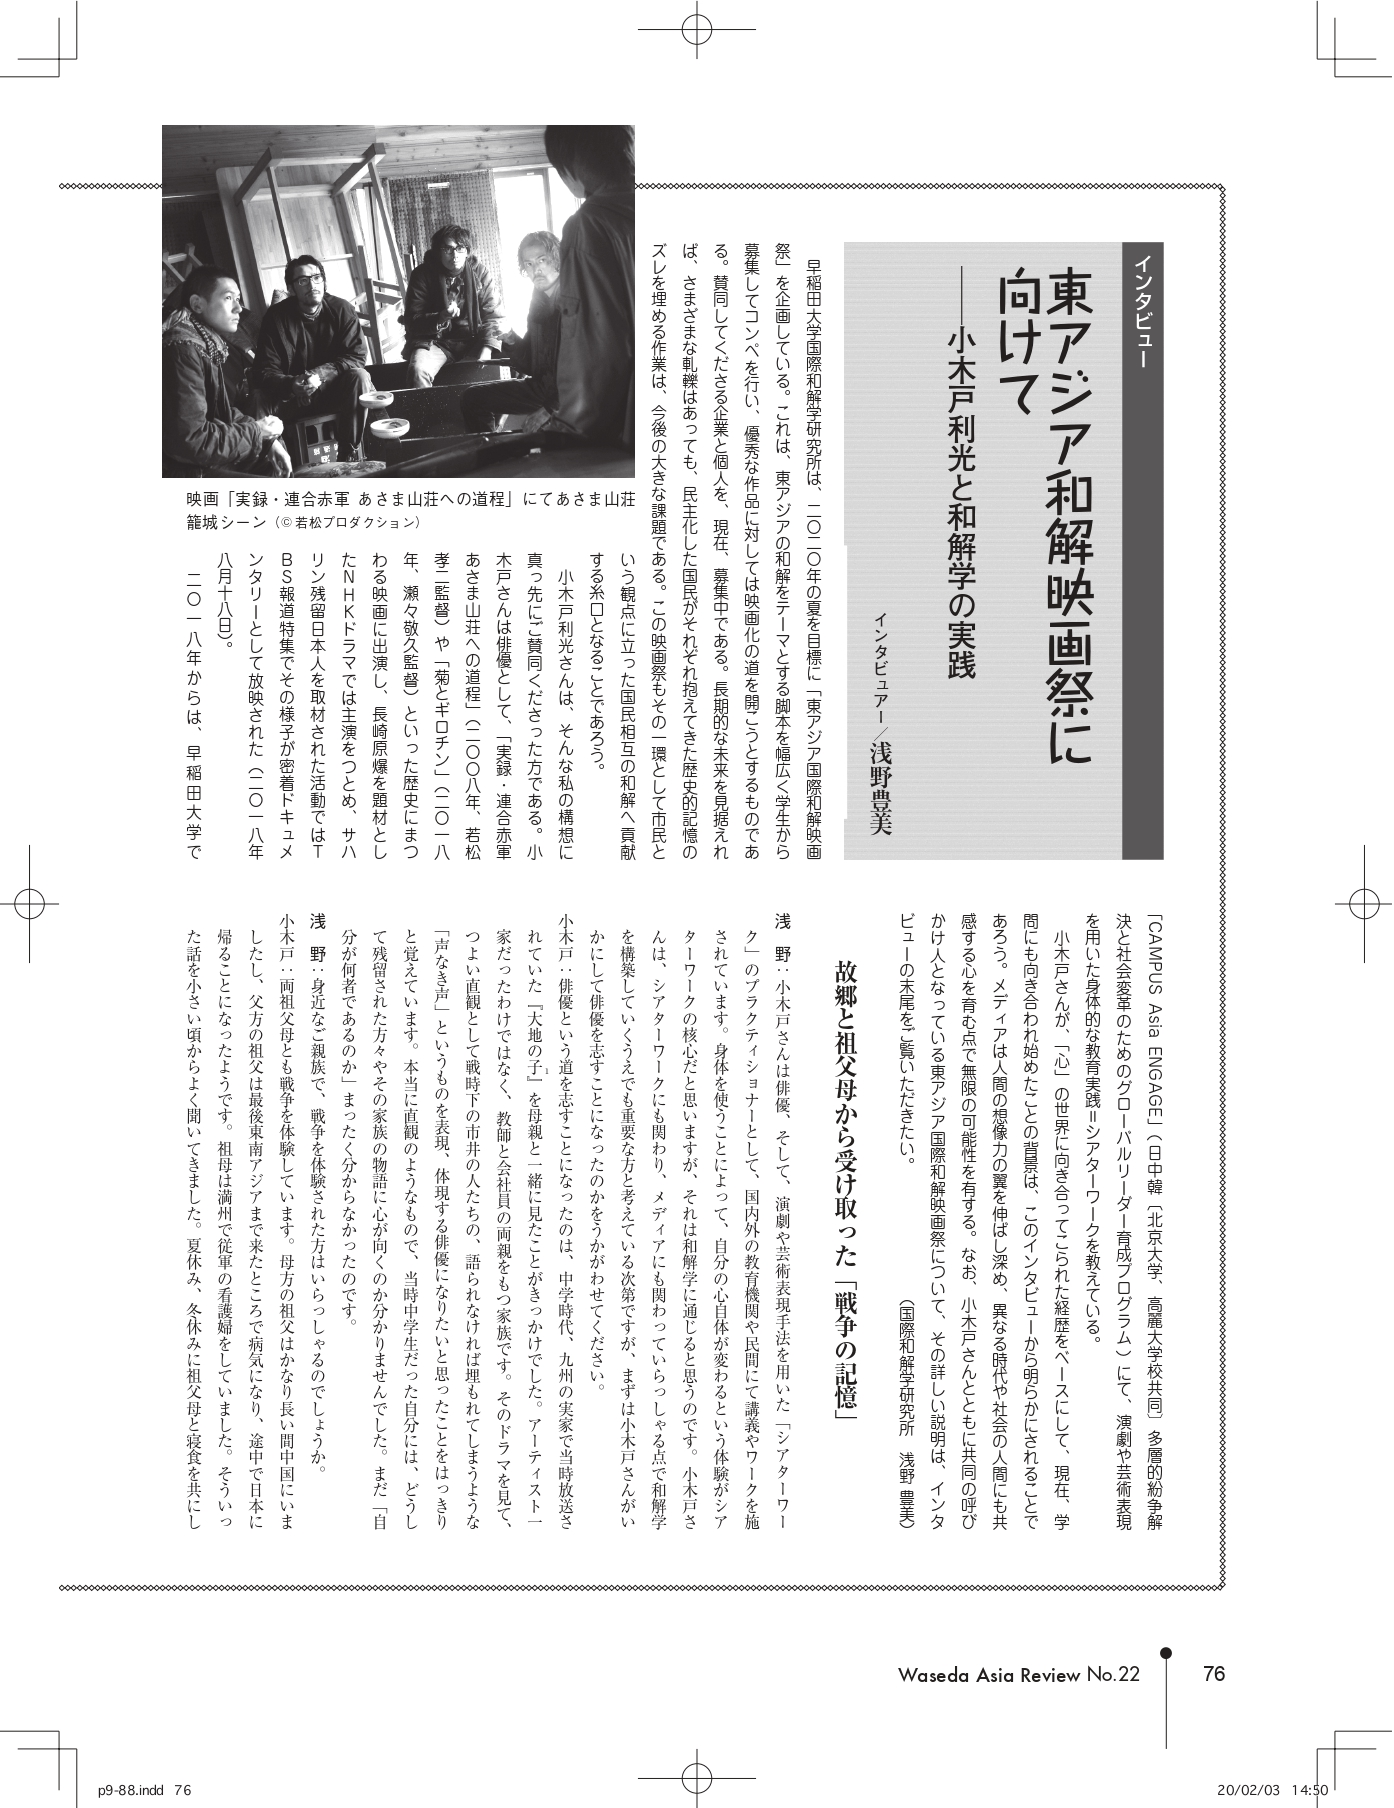 "Waseda Asia Review / ワセダアジアレビュー ロングインタビュー ""東アジア和解映画祭に向けて – 小木戸利光と和解学の実践"""